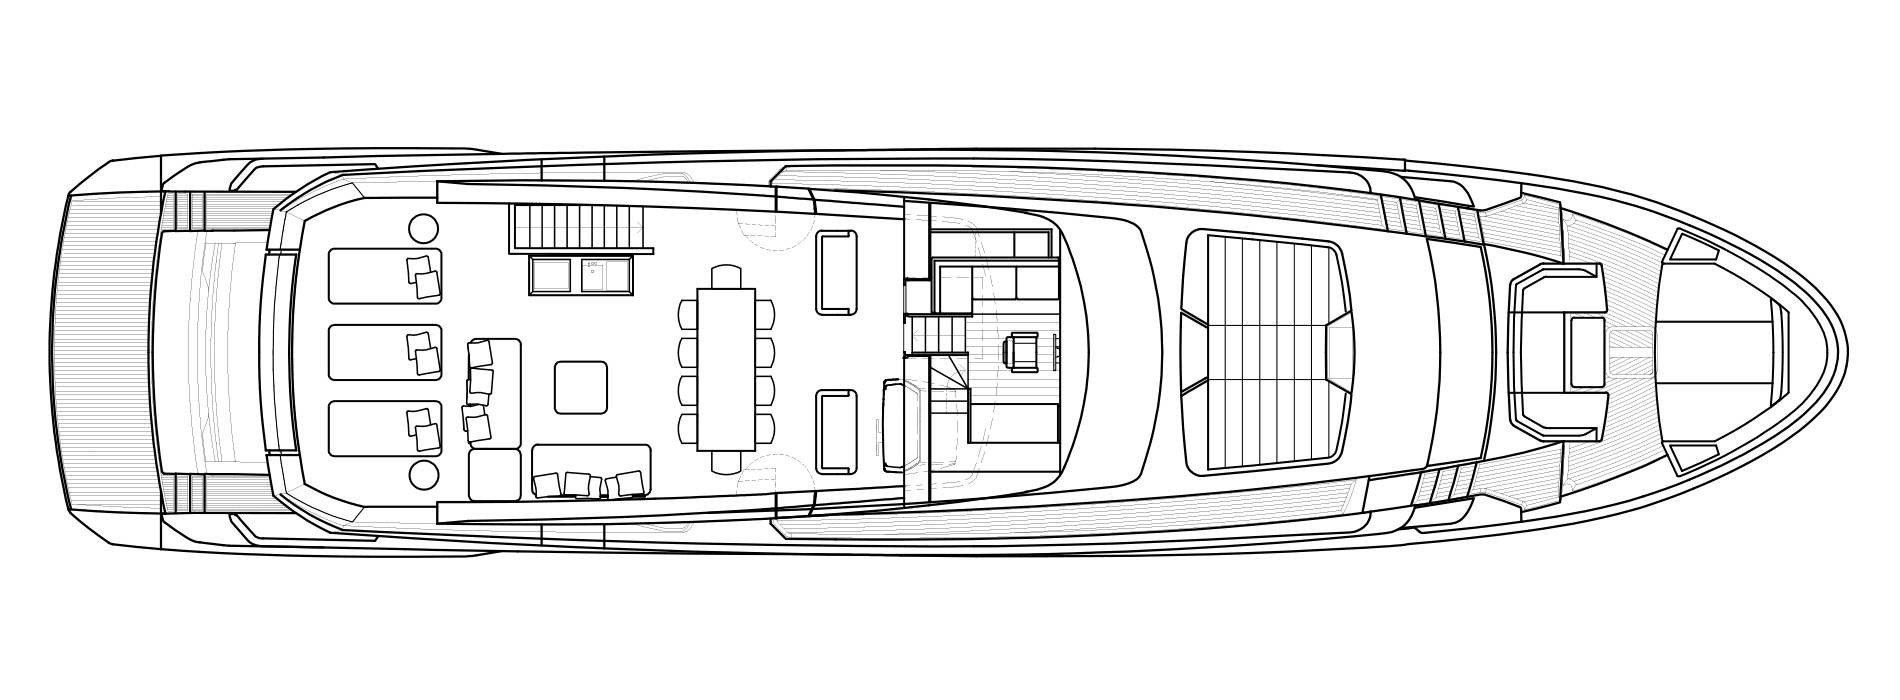 Sanlorenzo Yachts SL102 Asymmetric Flying bridge